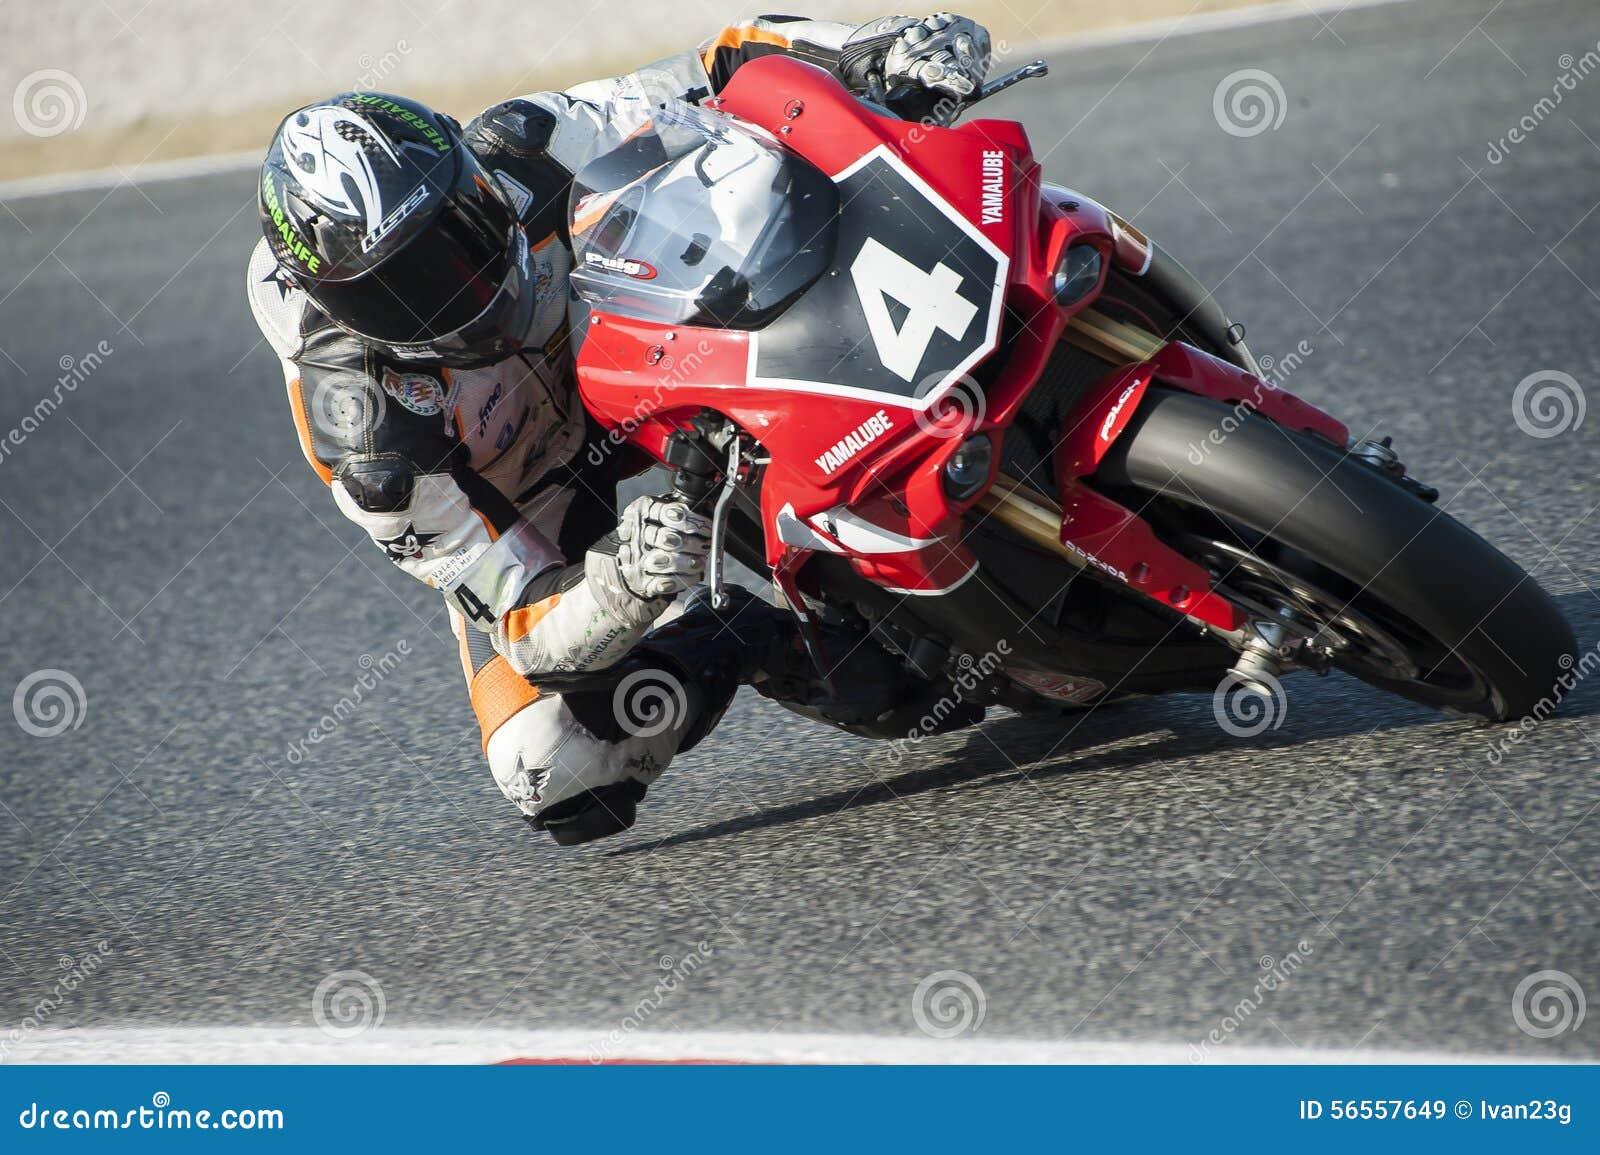 Download 24 ΑΝΤΟΧΗ ΩΡΩΝ MOTORCYCLING ΤΗΣ ΒΑΡΚΕΛΩΝΗΣ Εκδοτική Στοκ Εικόνα - εικόνα από αναβάτης, κοσμημάτων: 56557649